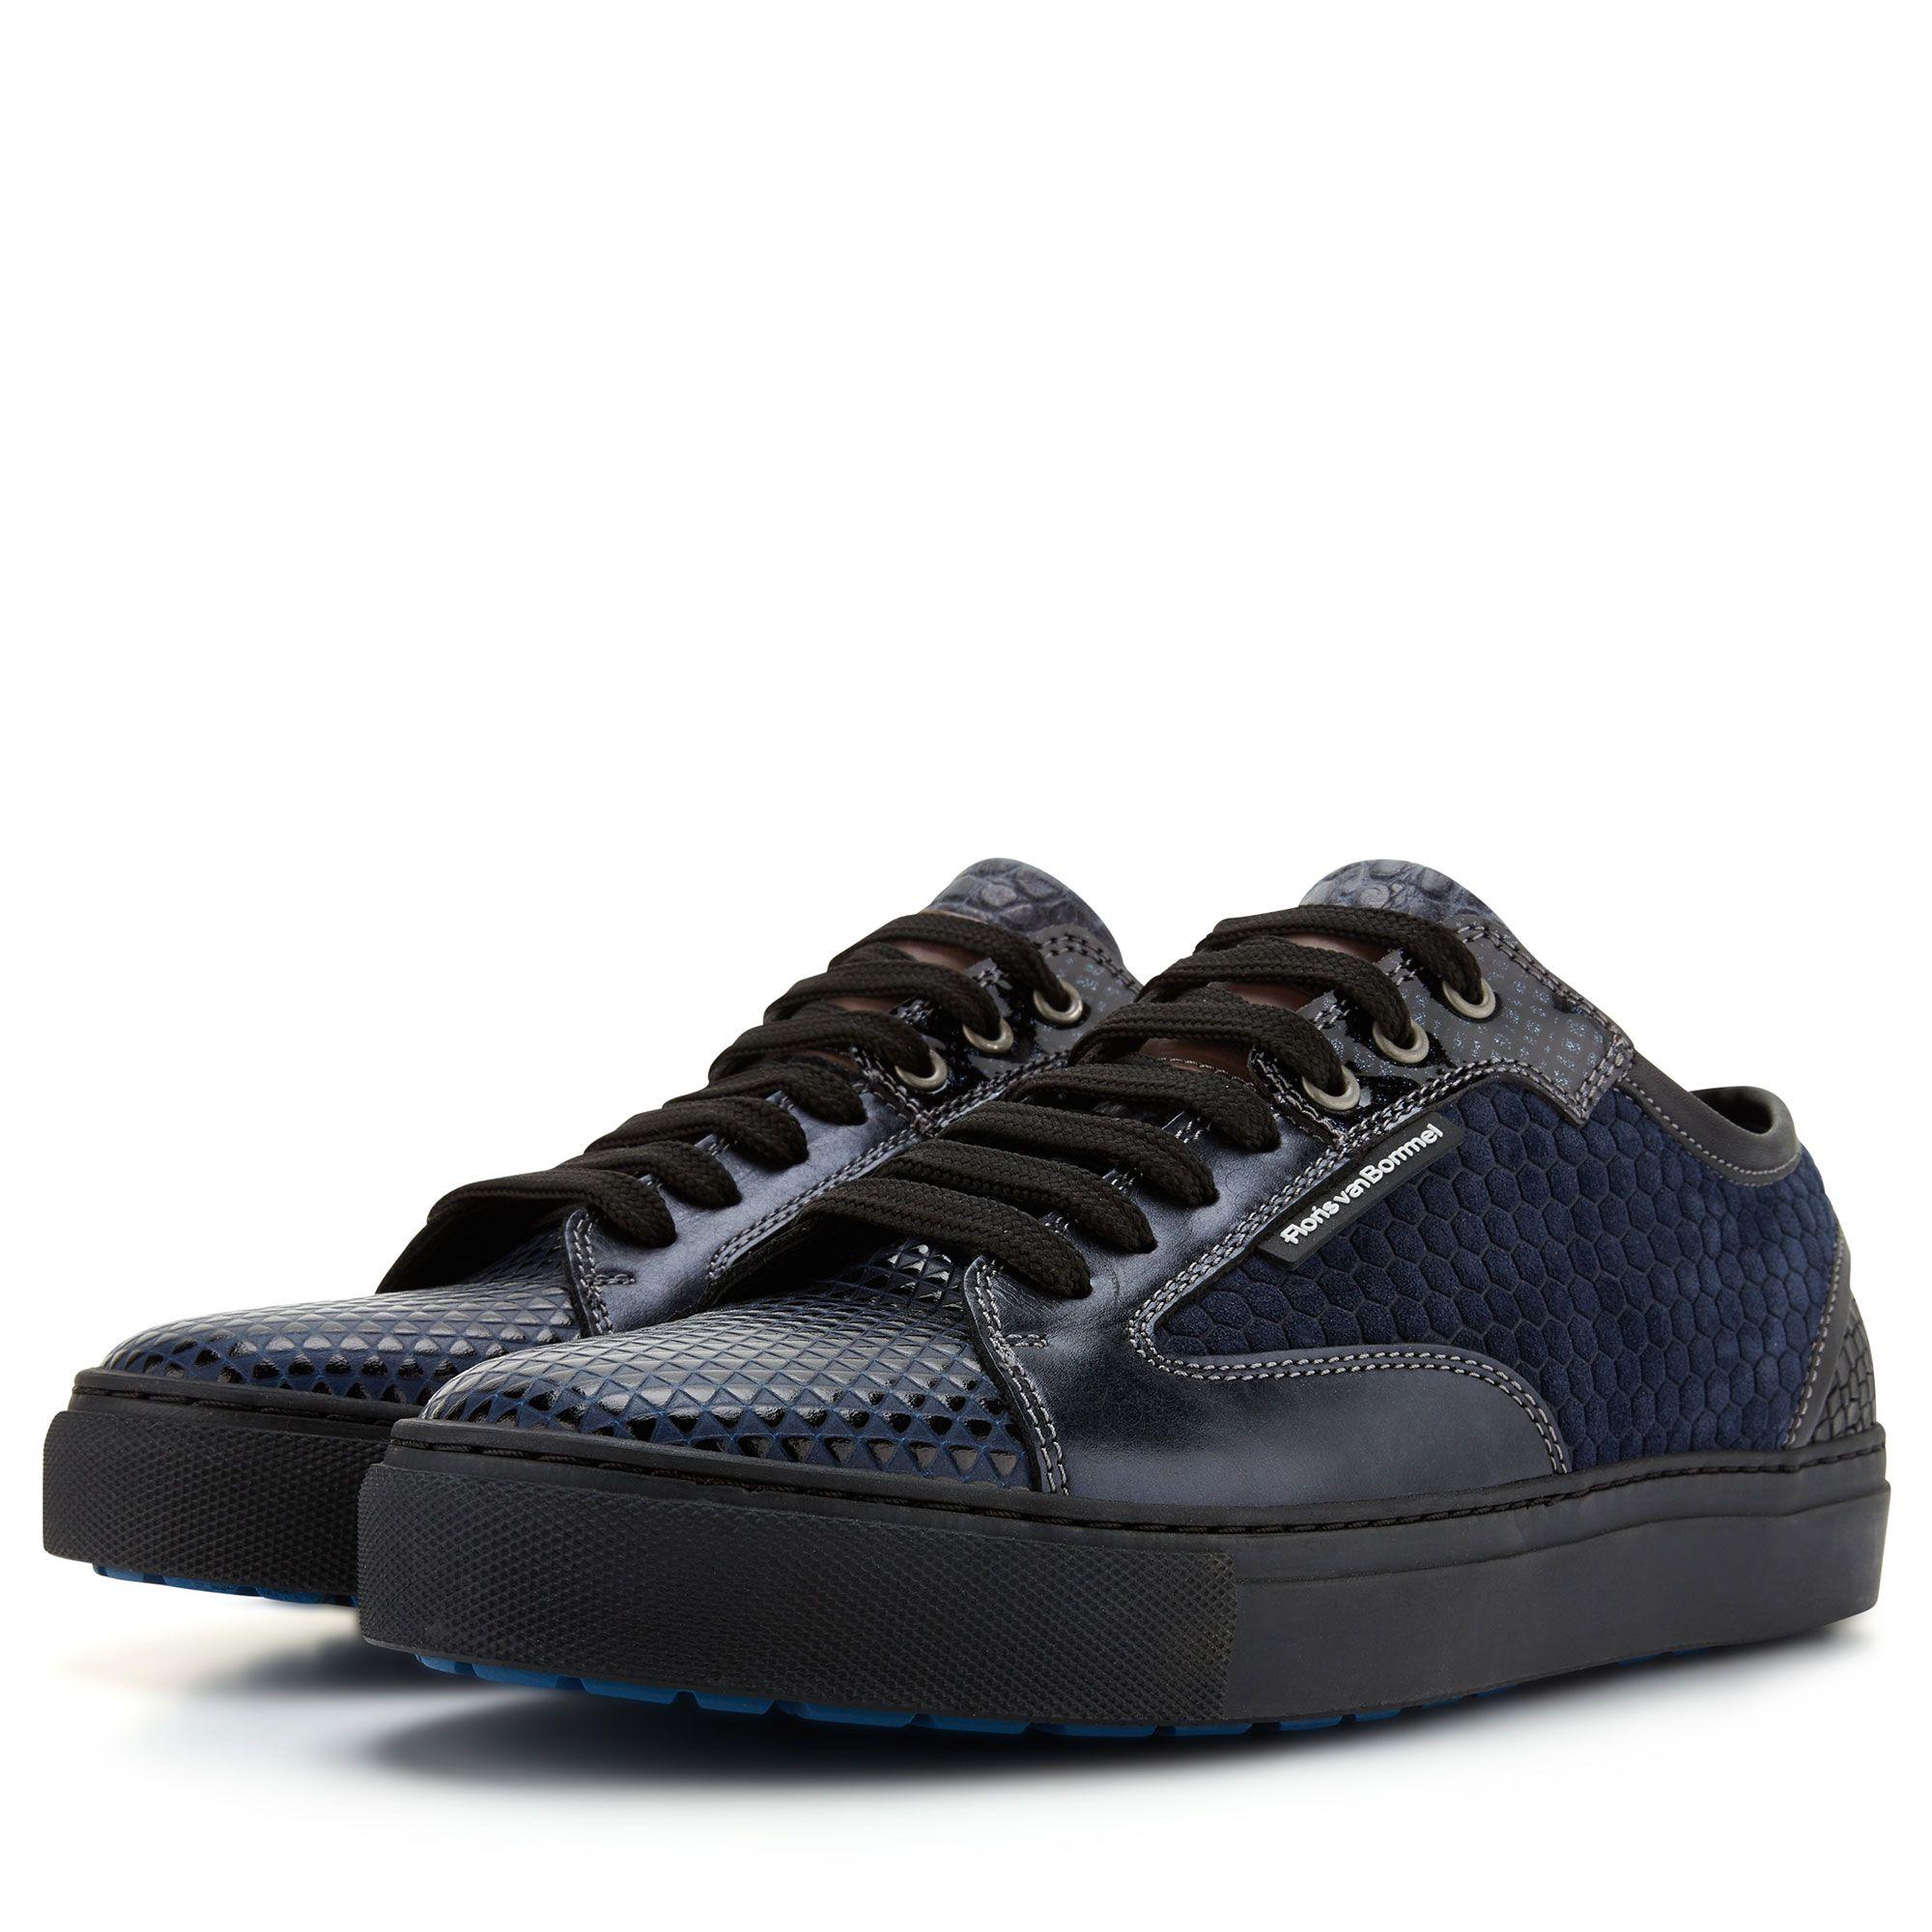 14319 04 Floris Van Bommel Dark Blue Leather Men S Sneaker Mens Sport Sneakers Sneakers Men Fashion Sneakers